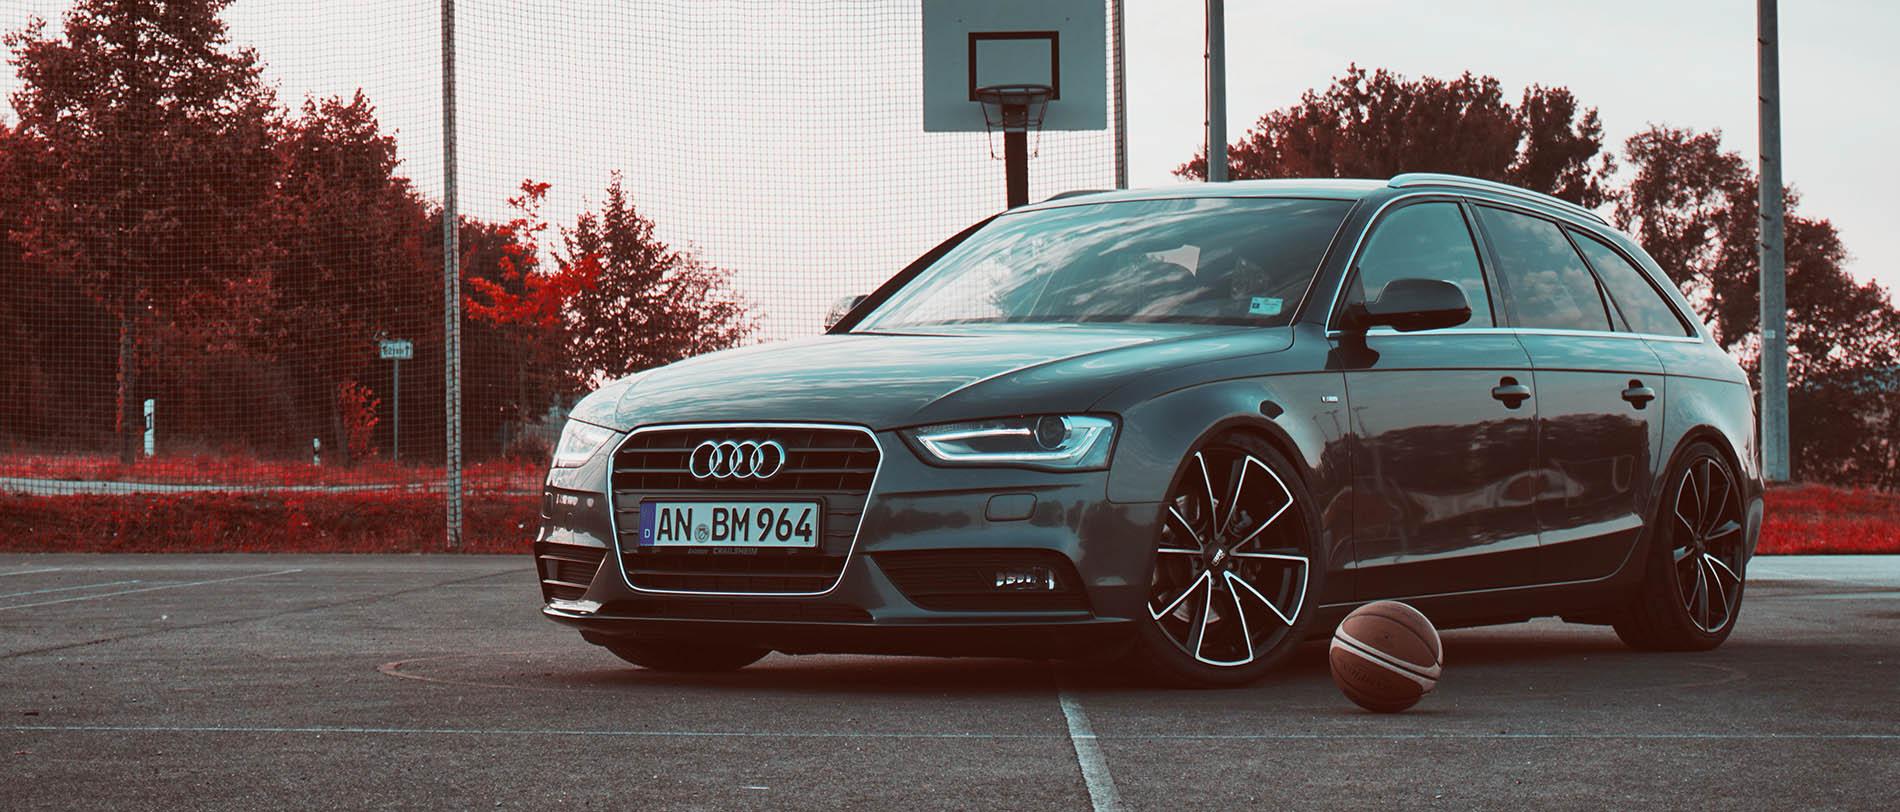 Audi Tageszulassung bestellen